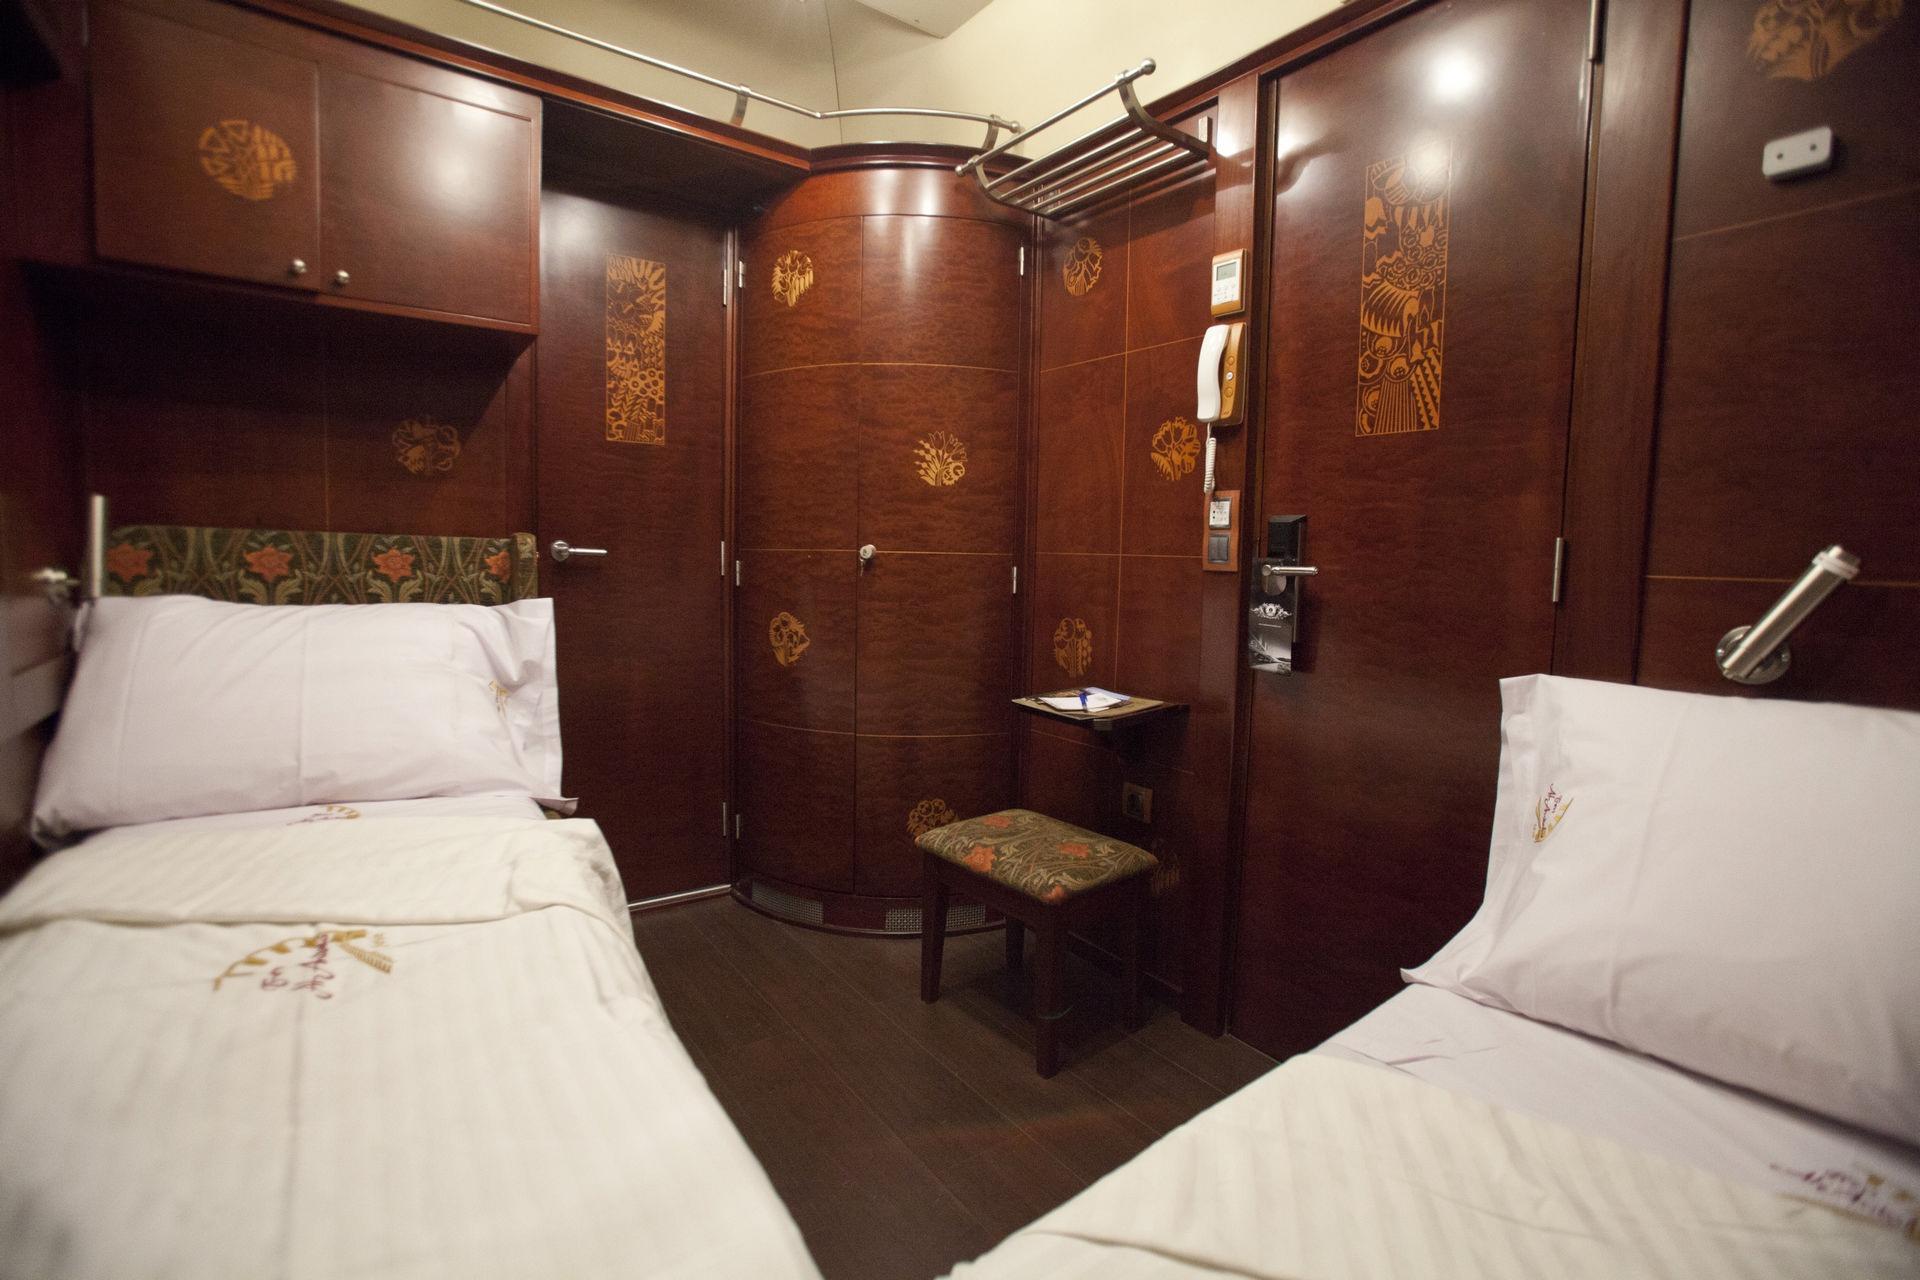 NOMAD-luksusowe-pociągi-w-Hiszpani-Al-Andalus-06